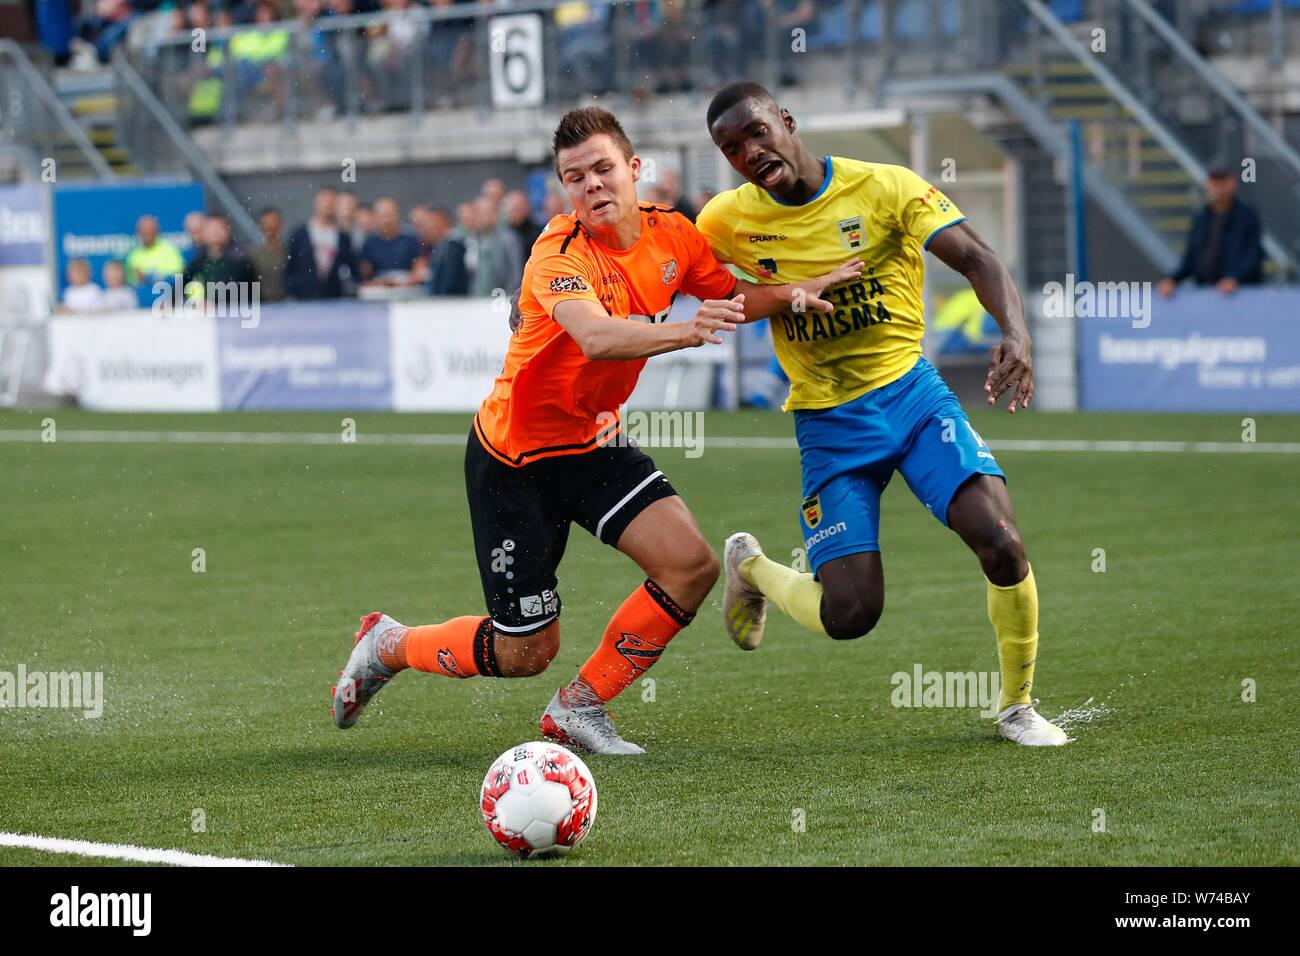 02 08 2019 Voetbal Cambuur V Fc Volendam Leeuwarden Alex Bangura Of Sc Cambuur Nick Runderkamp Of Fc Volendam Stock Photo Alamy